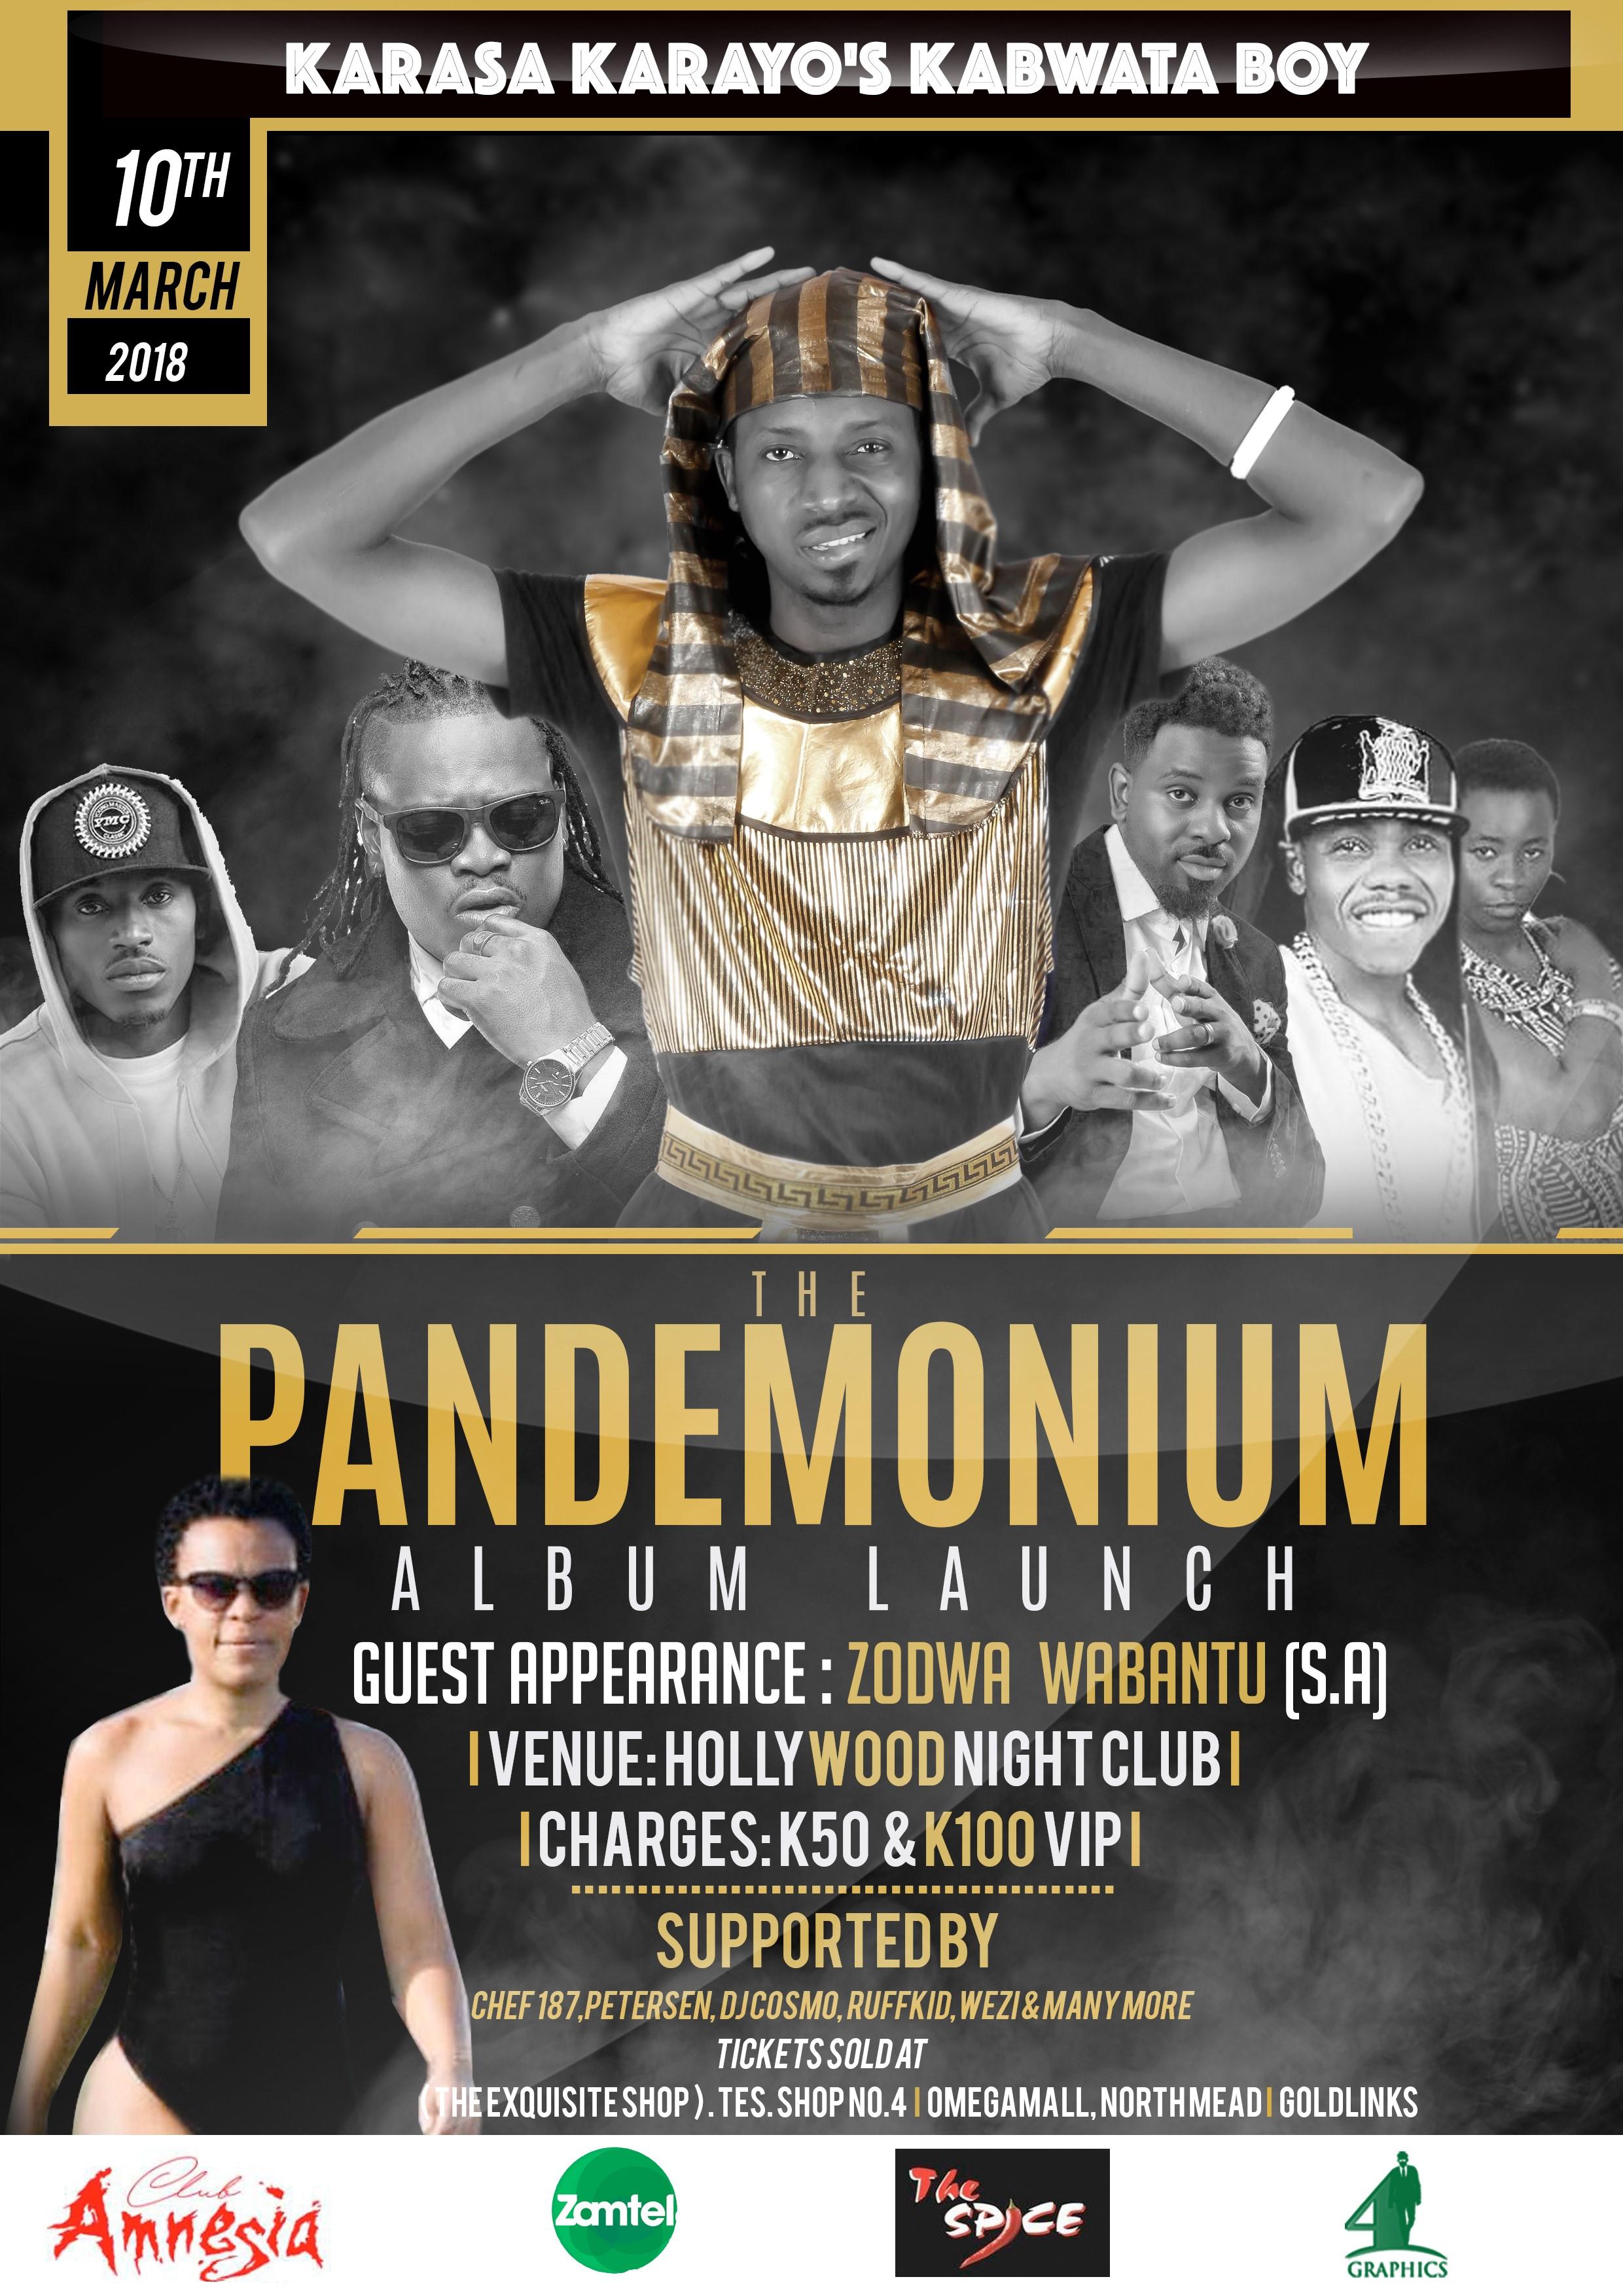 KARASA Presents the PANDEMONIUM Album Launch